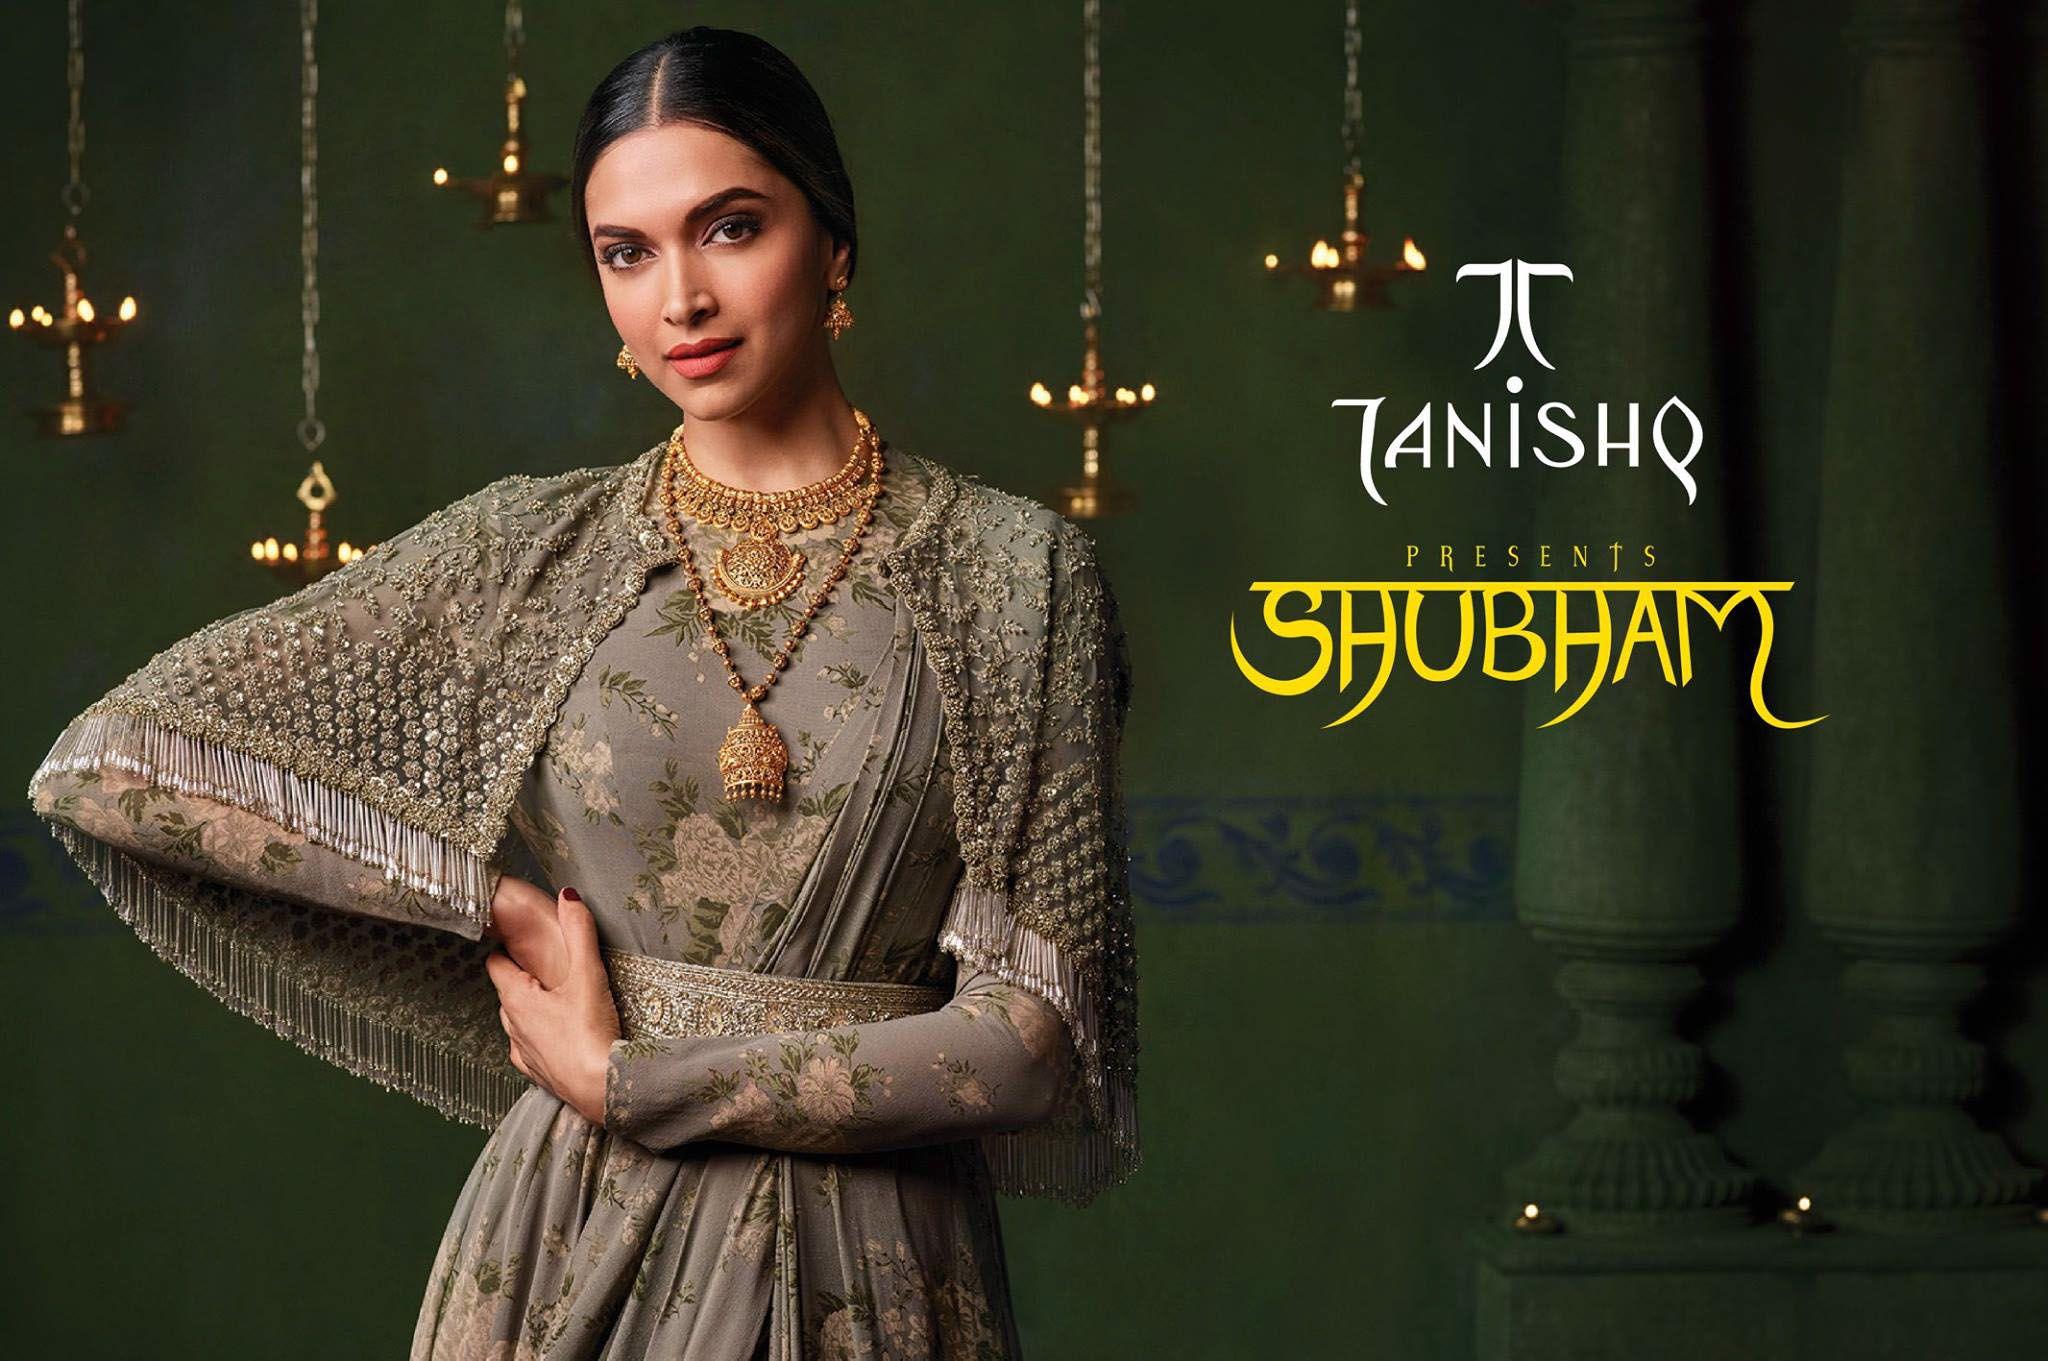 Tanishq Festive Campaign 2016 With Deepika Padukone Guzellik